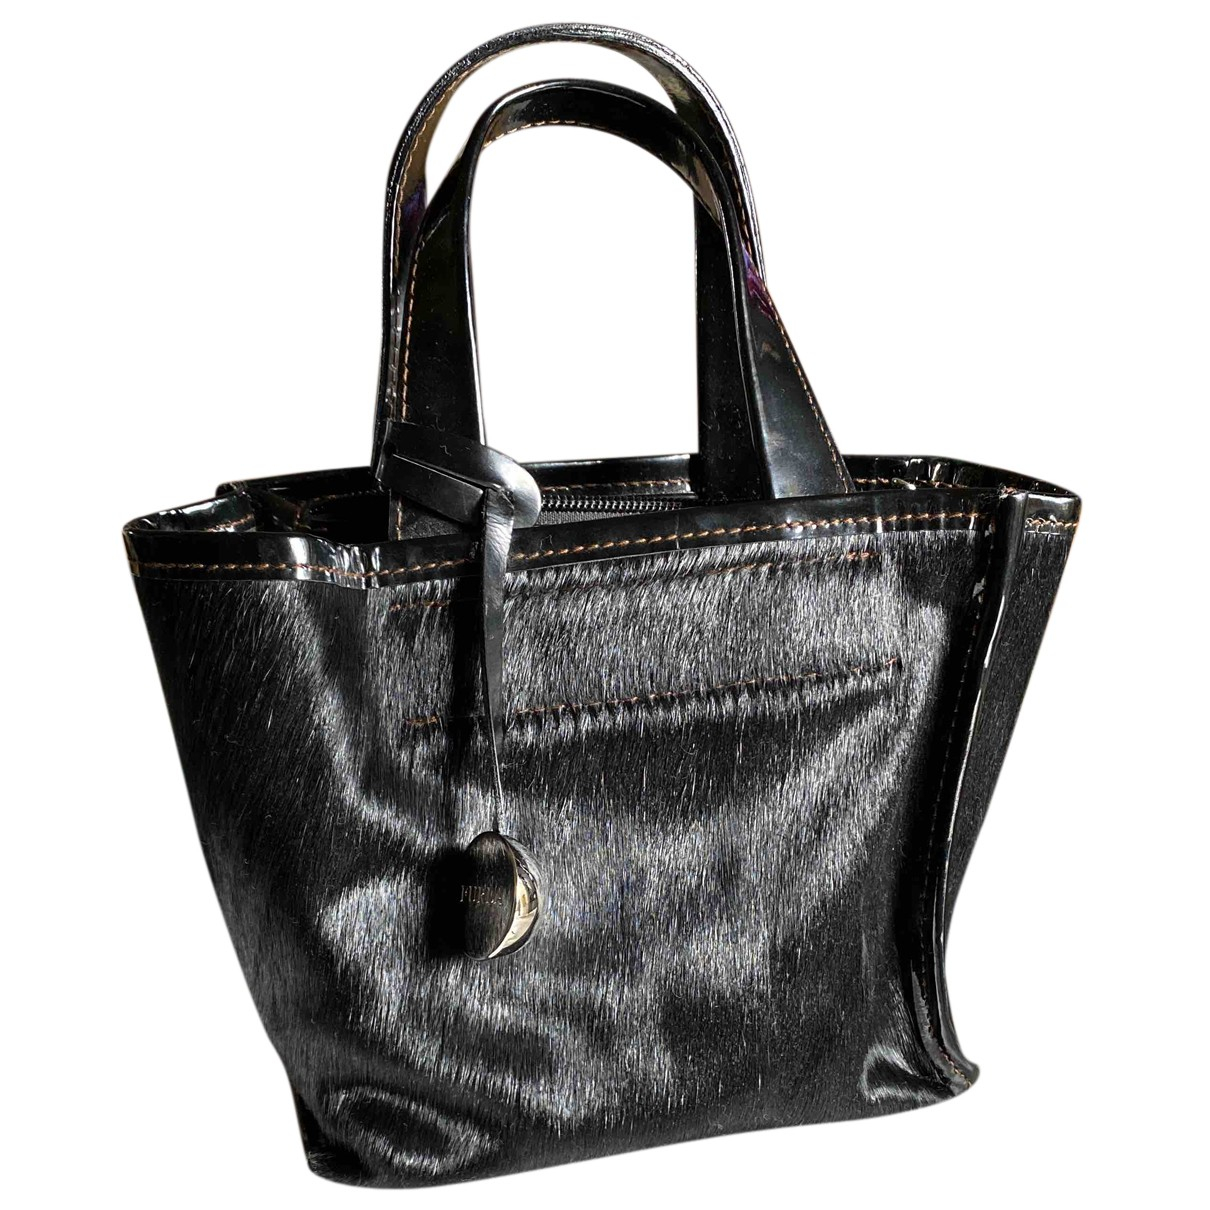 Furla N Black Pony-style calfskin handbag for Women N